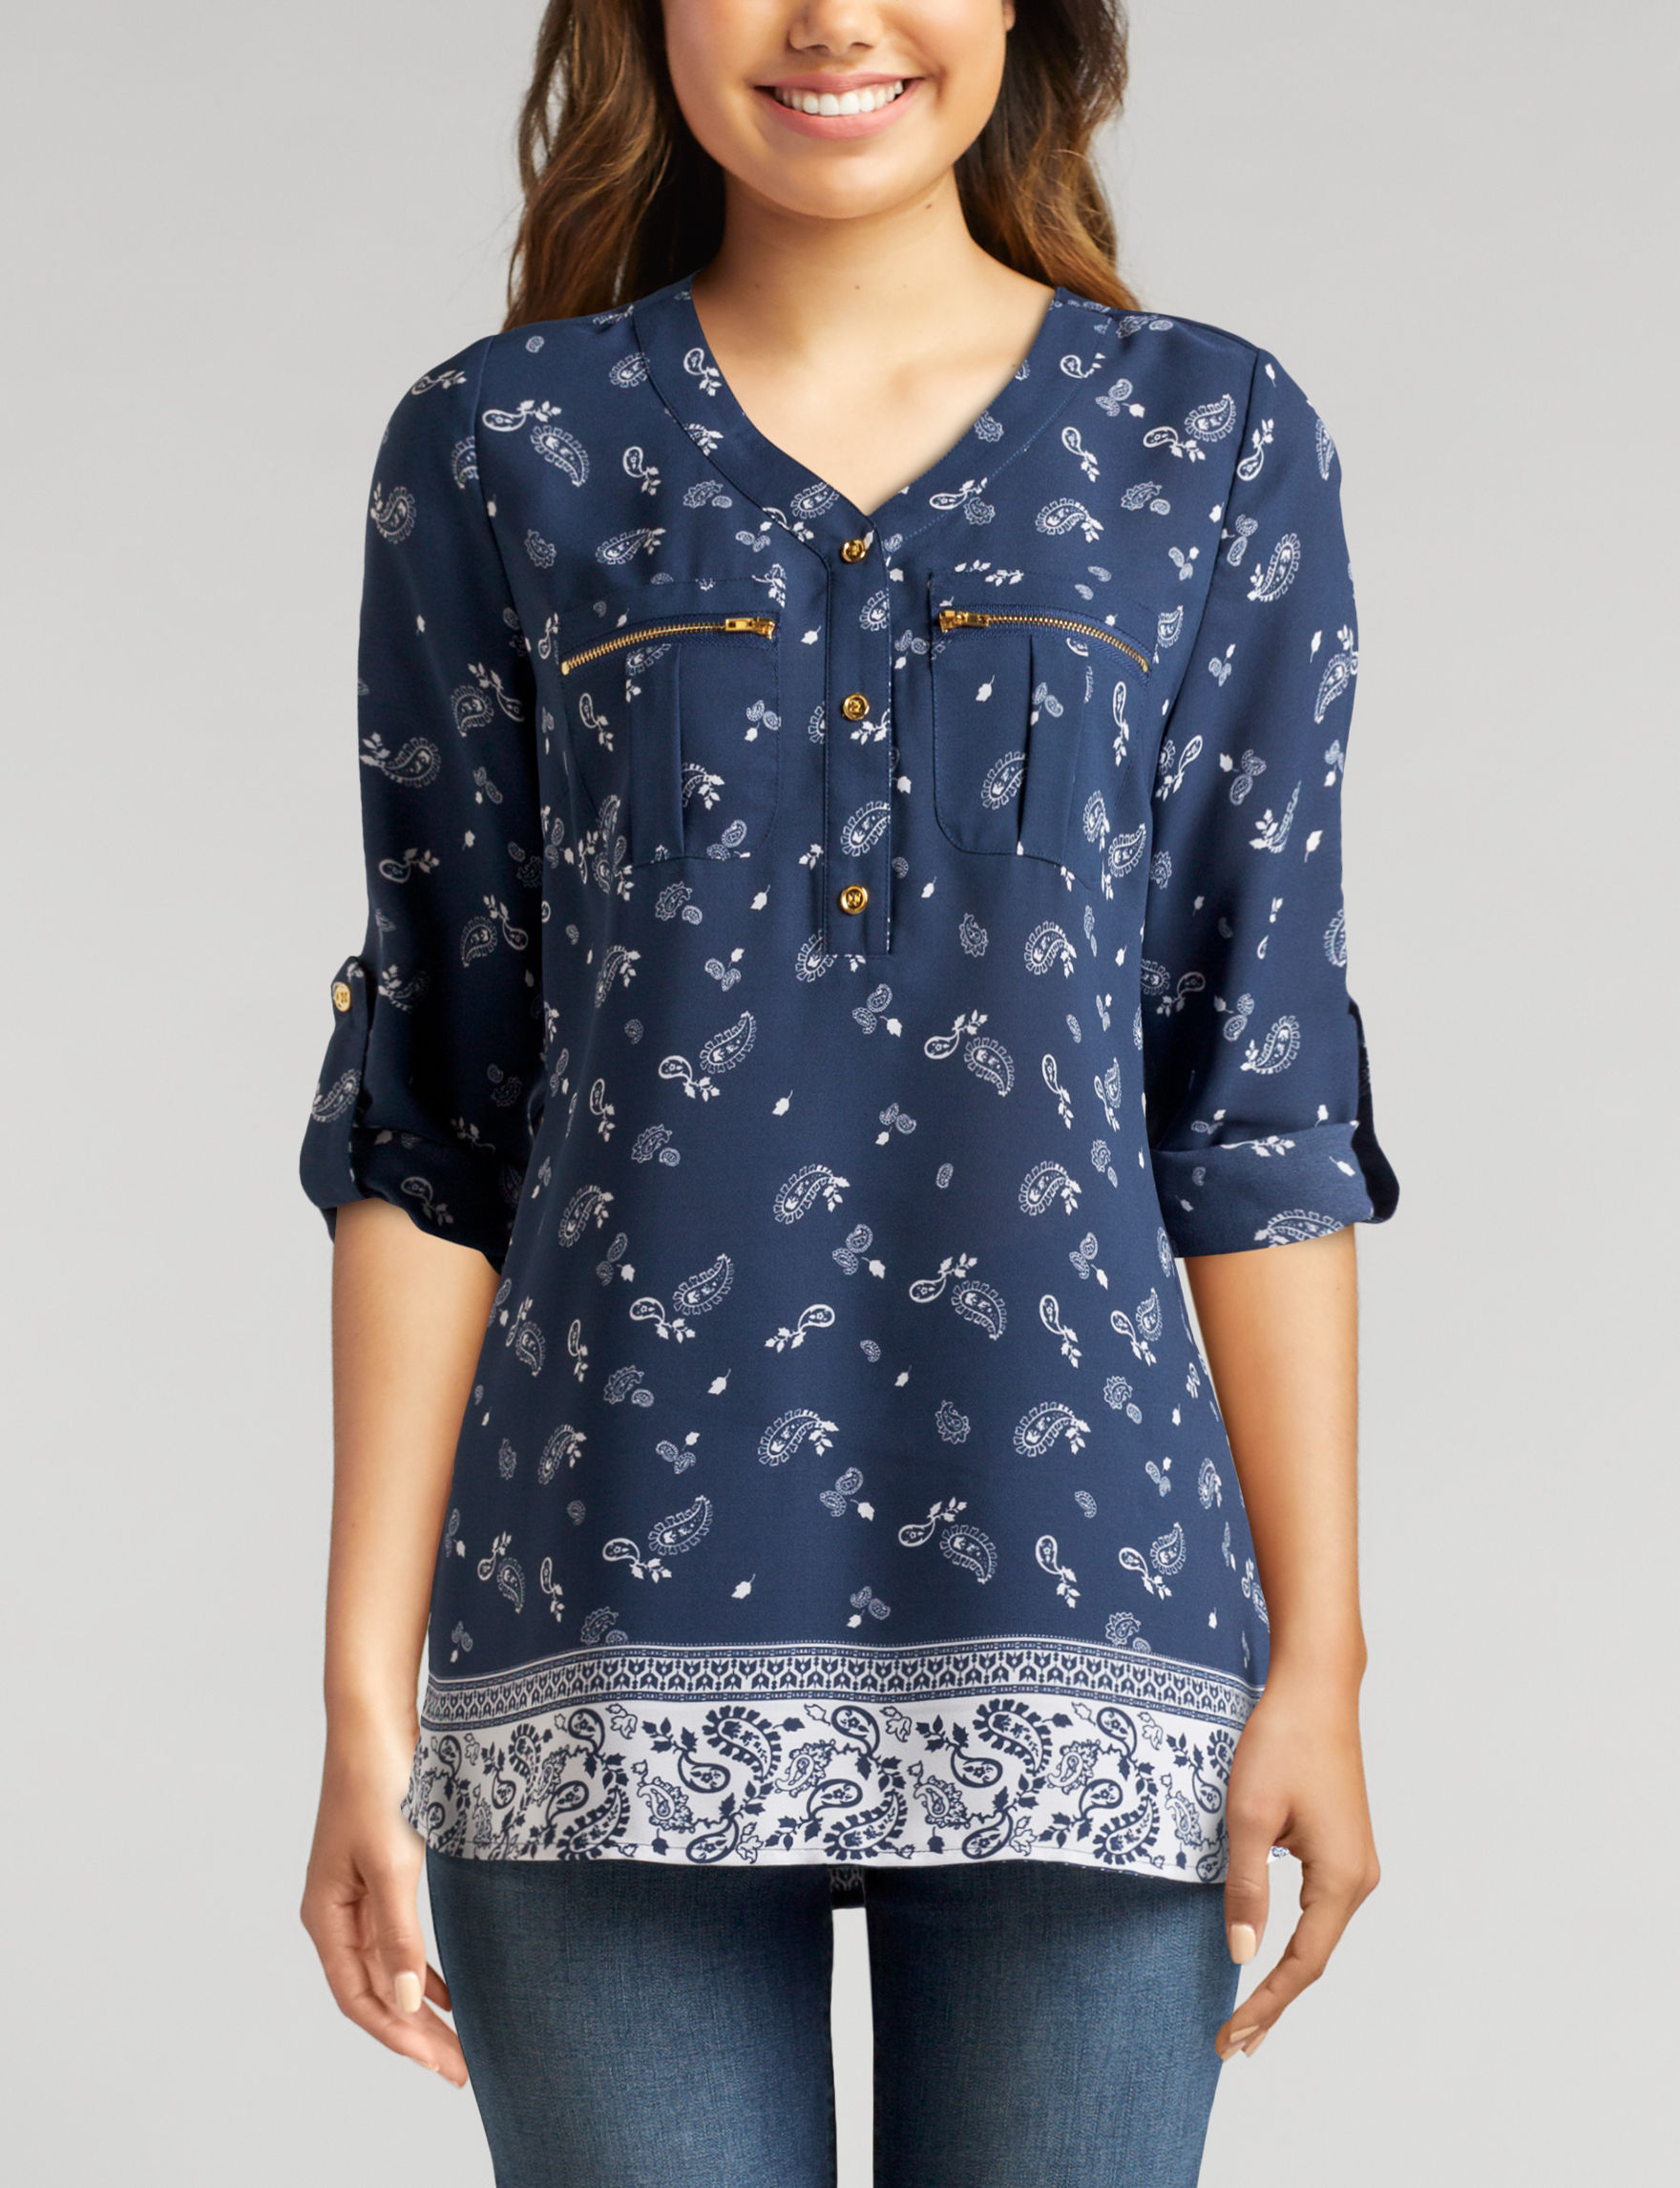 Wishful Park Navy Shirts & Blouses